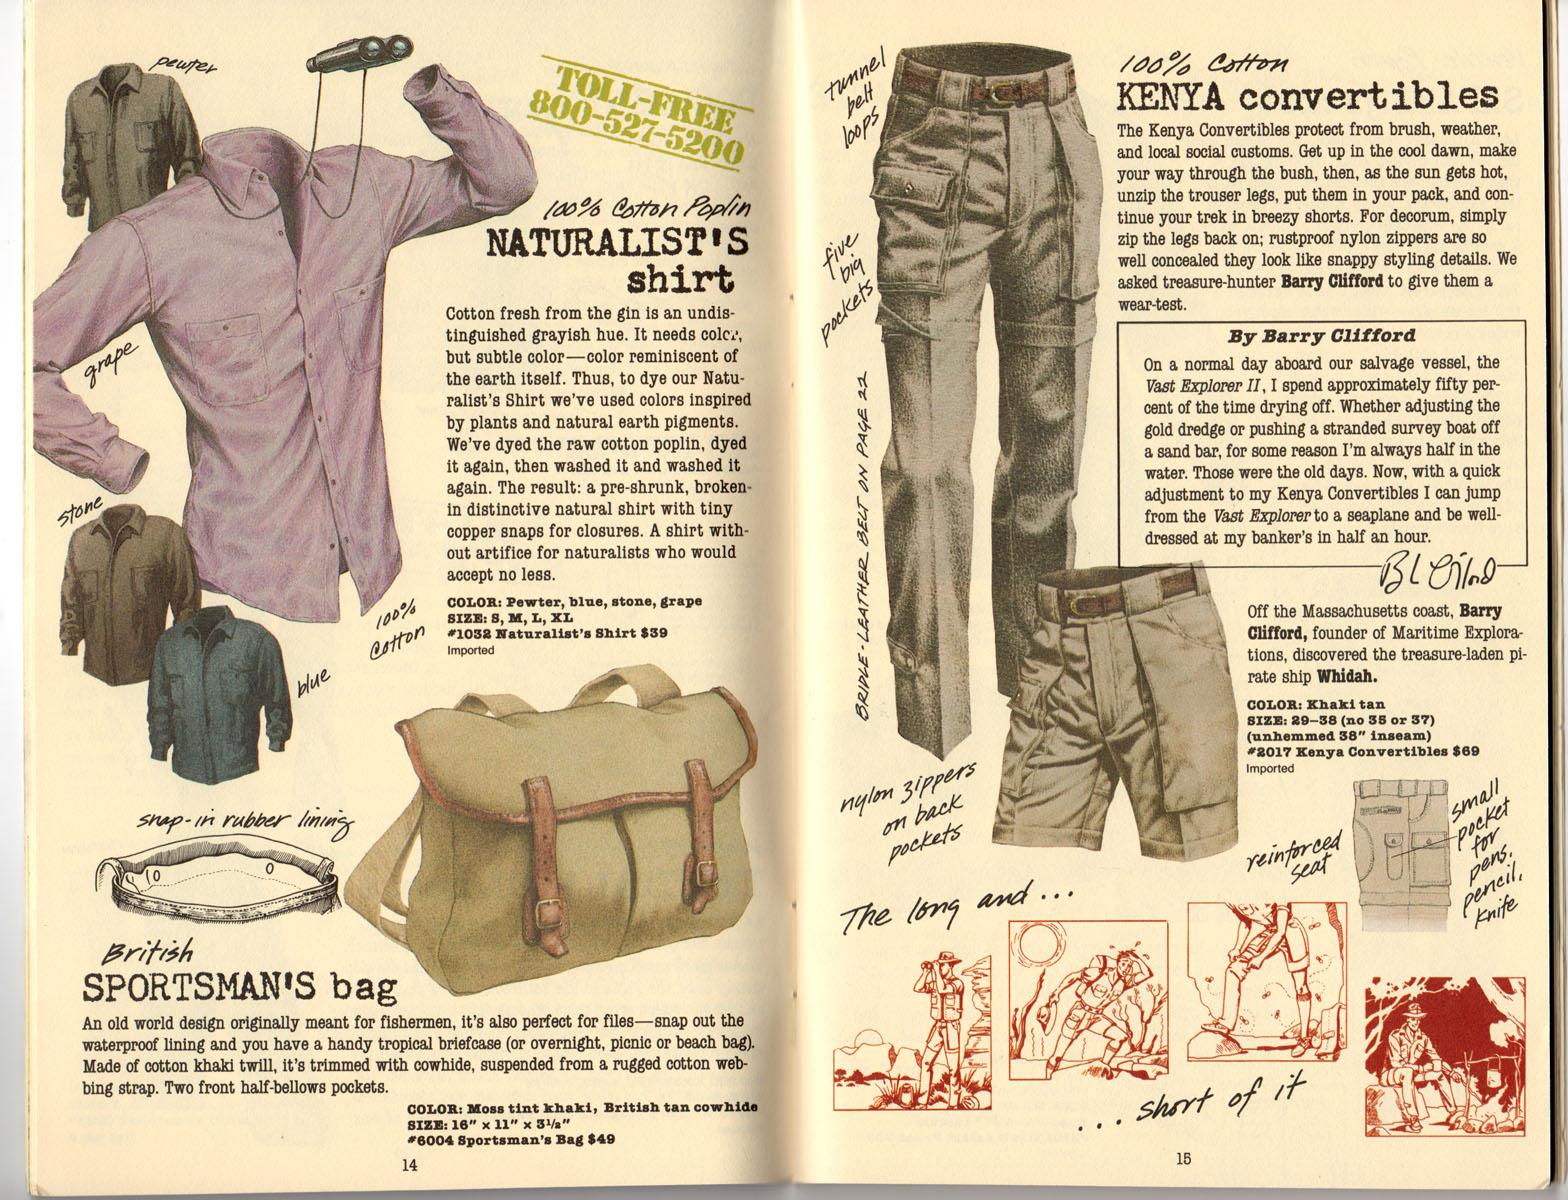 Banana Republic Summer 1985 Update #24 Naturalist's Shirt, Sportsman's Bag, Kenya Convertibles